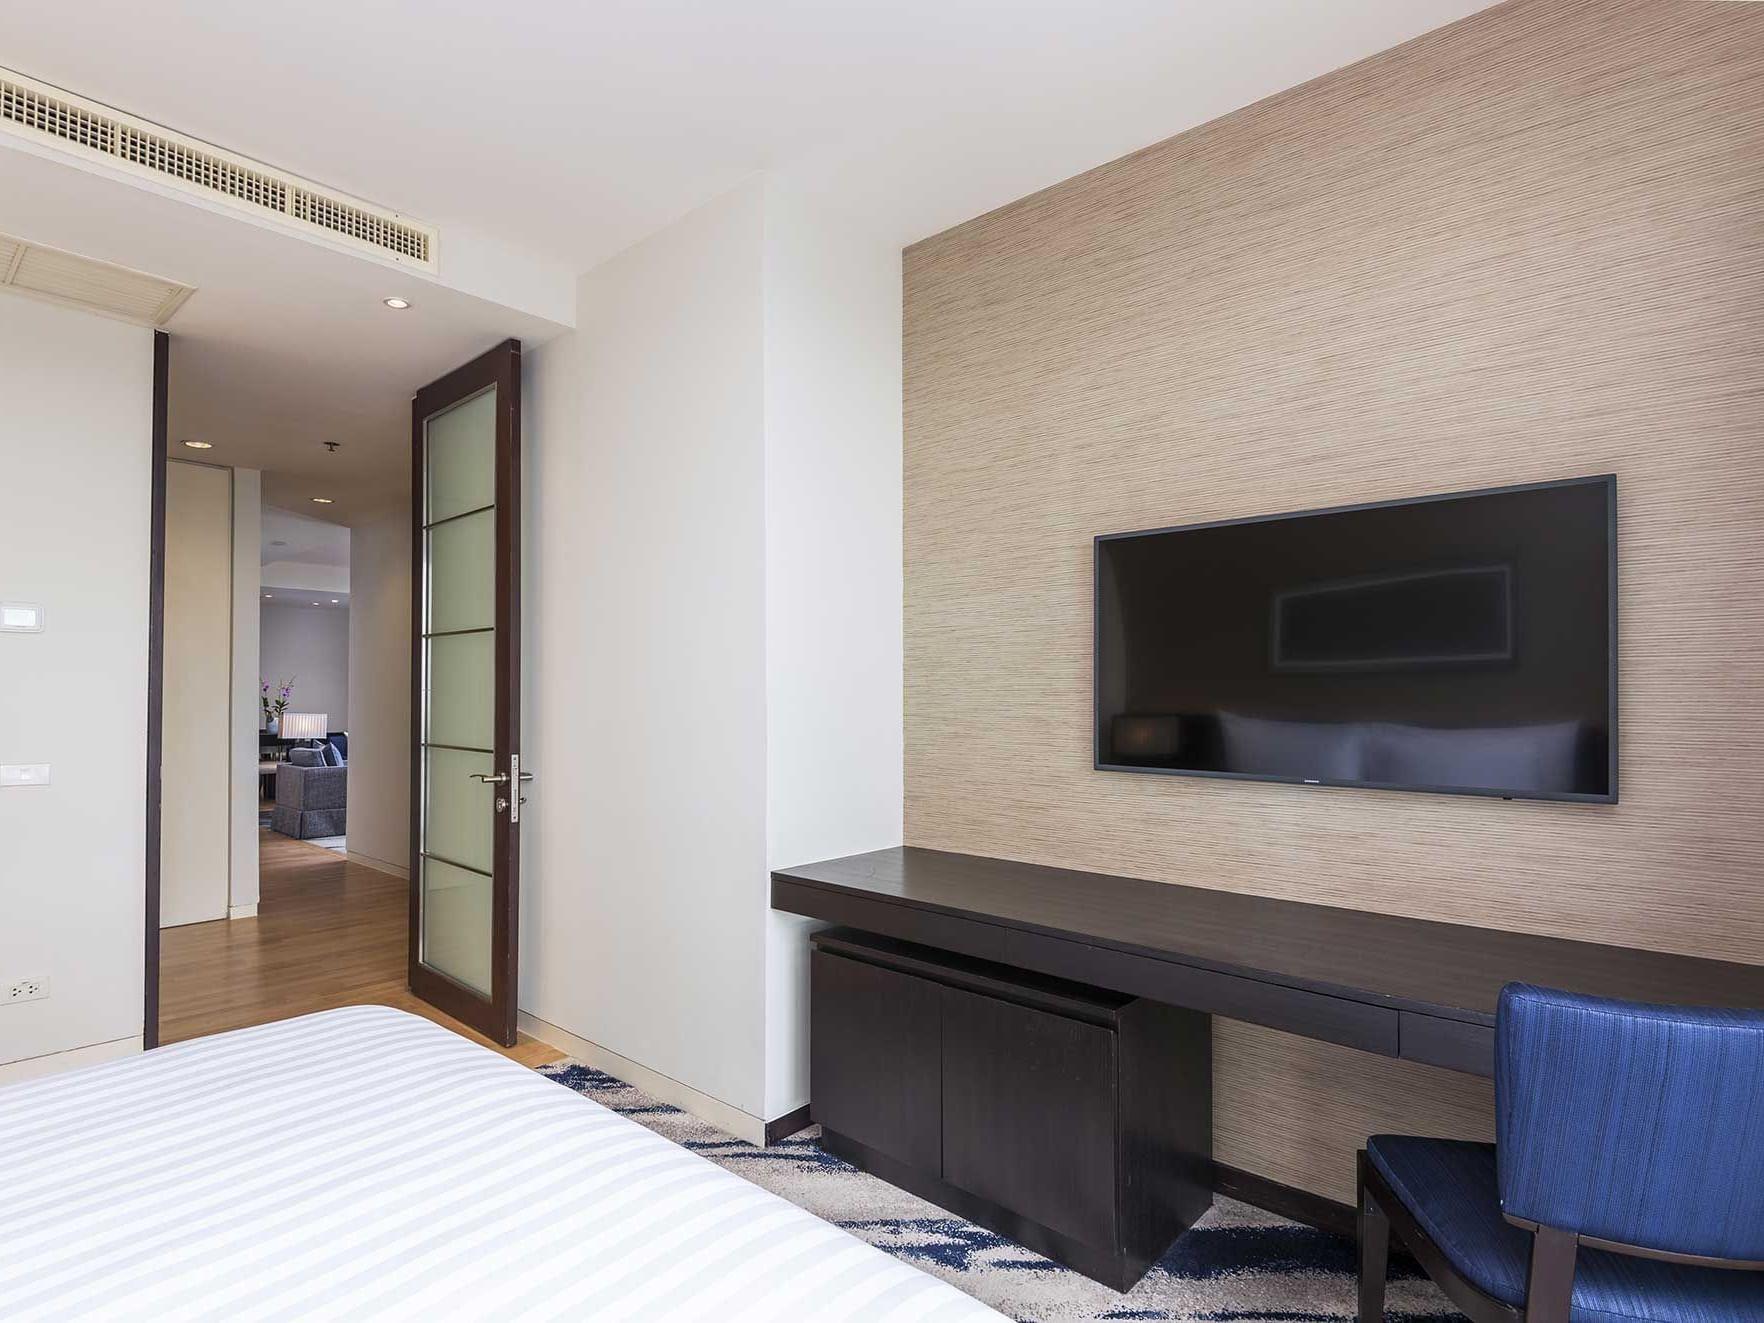 Two bedroom grand deluxe suite at Emporium suites by Chatrium